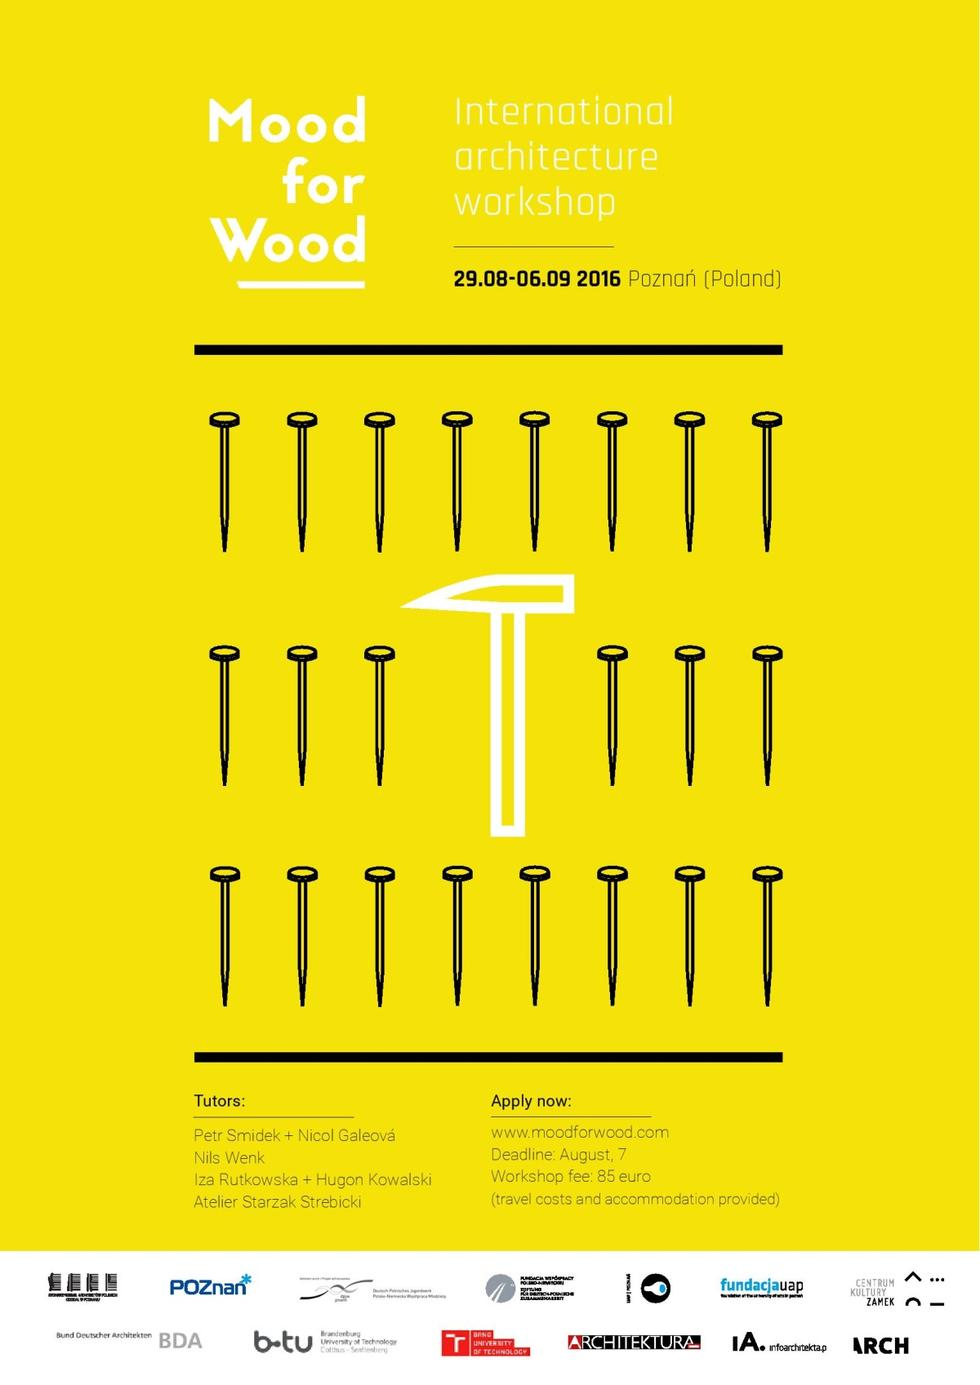 Warsztaty studenckie Mood for Wood